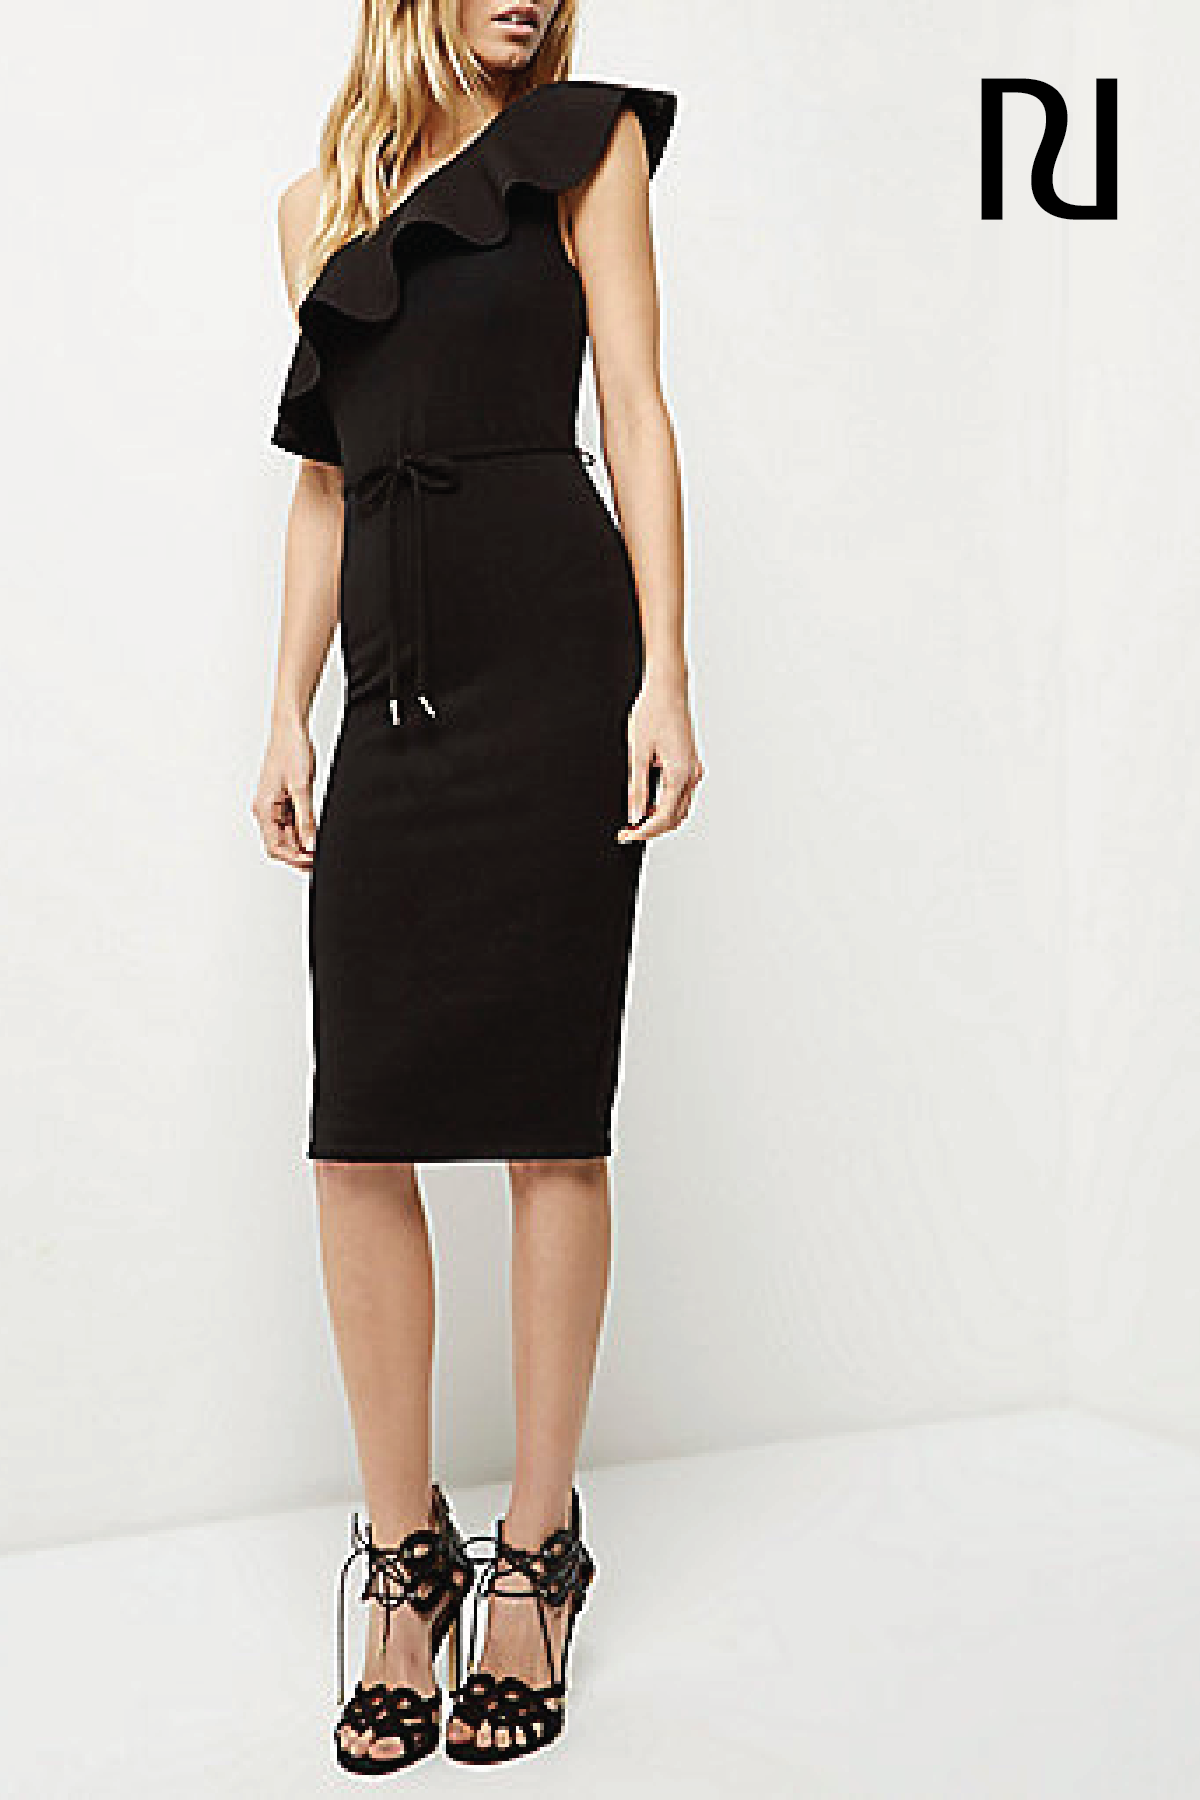 Black Ruffle Asymmetric Bodycon Dress Bodycon Dresses Dresses Women Asymmetric Bodycon Dress Prom Heels Womens Dresses [ 1800 x 1200 Pixel ]